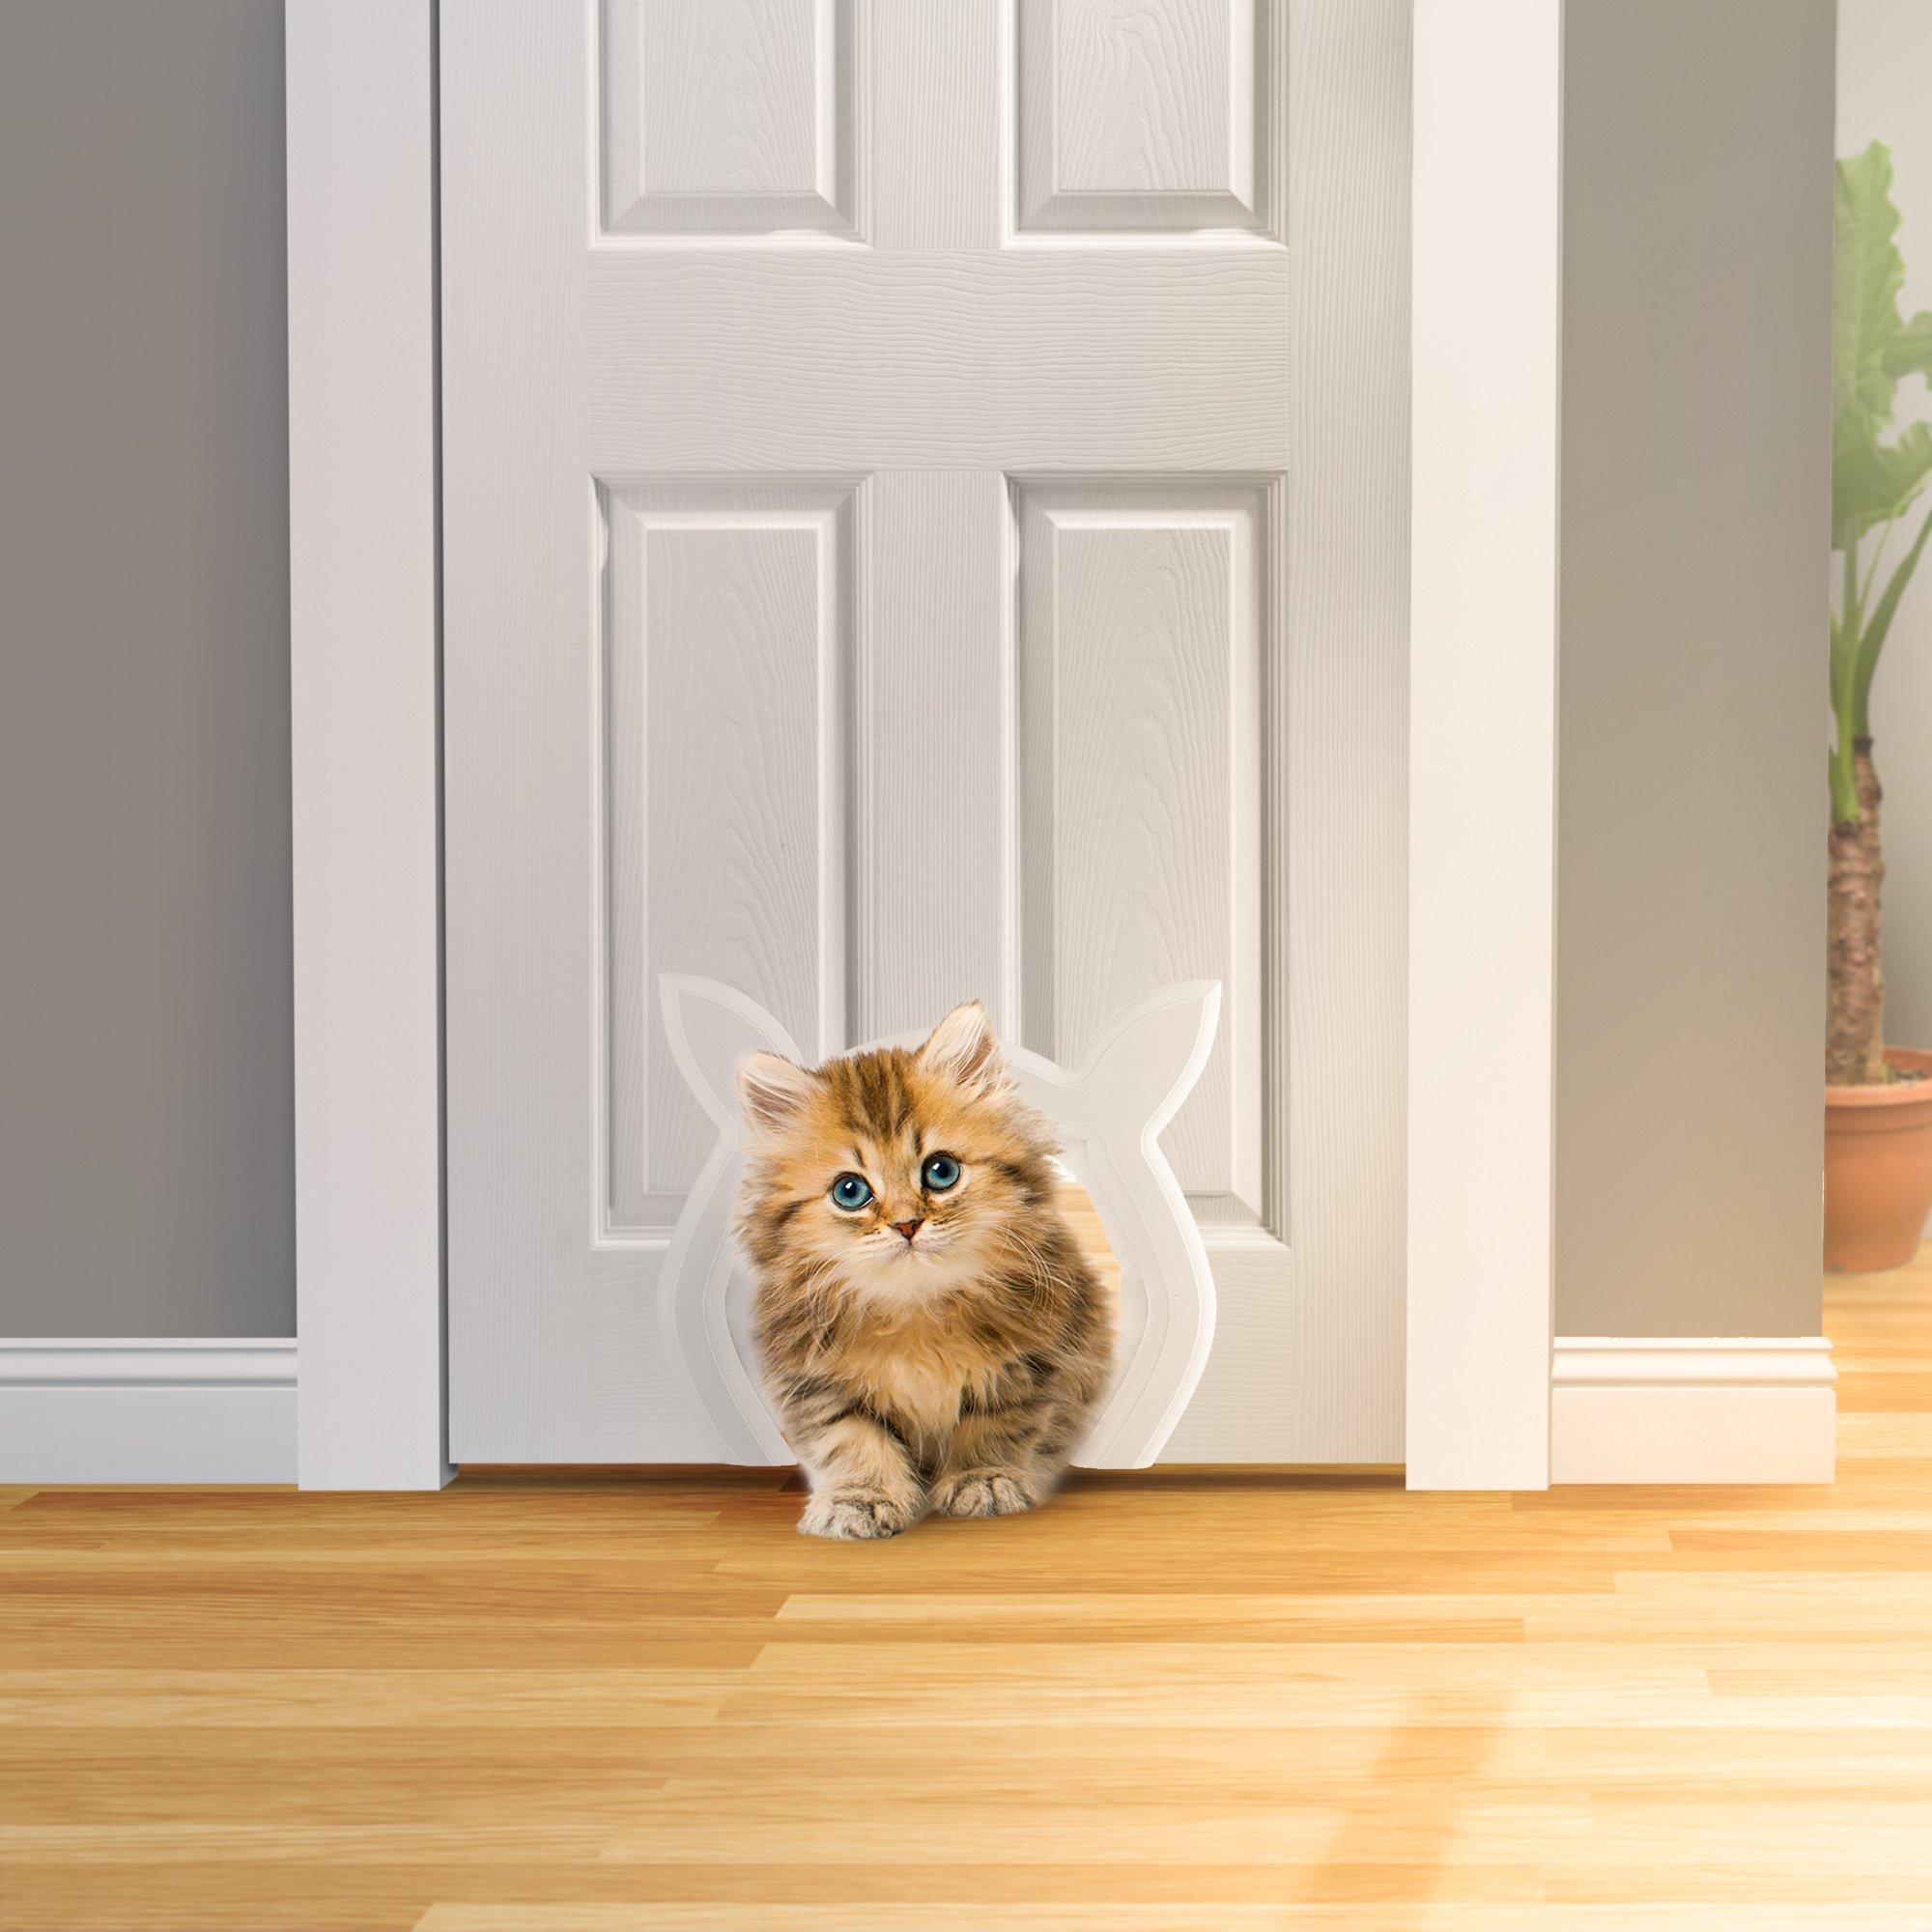 Prouder Pet Interior Cat Door   Fits Most Standard Door Sizes   Safe For  Cats Up To 25 Lbs  Litter Box Concealer   No More Mess